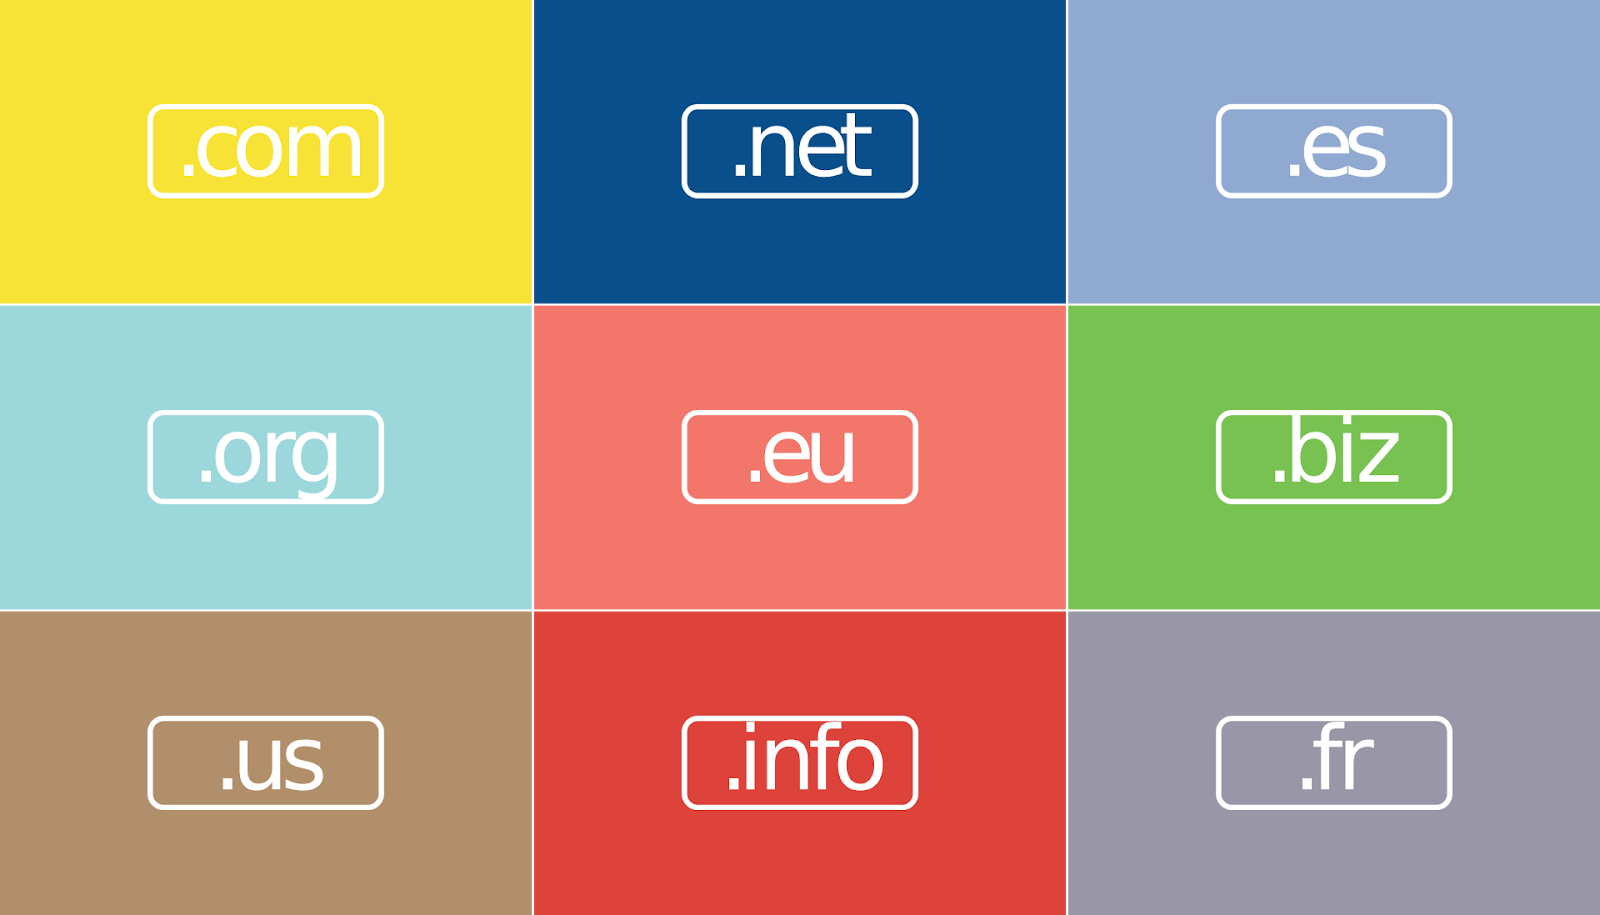 Deconstructing Domain Names